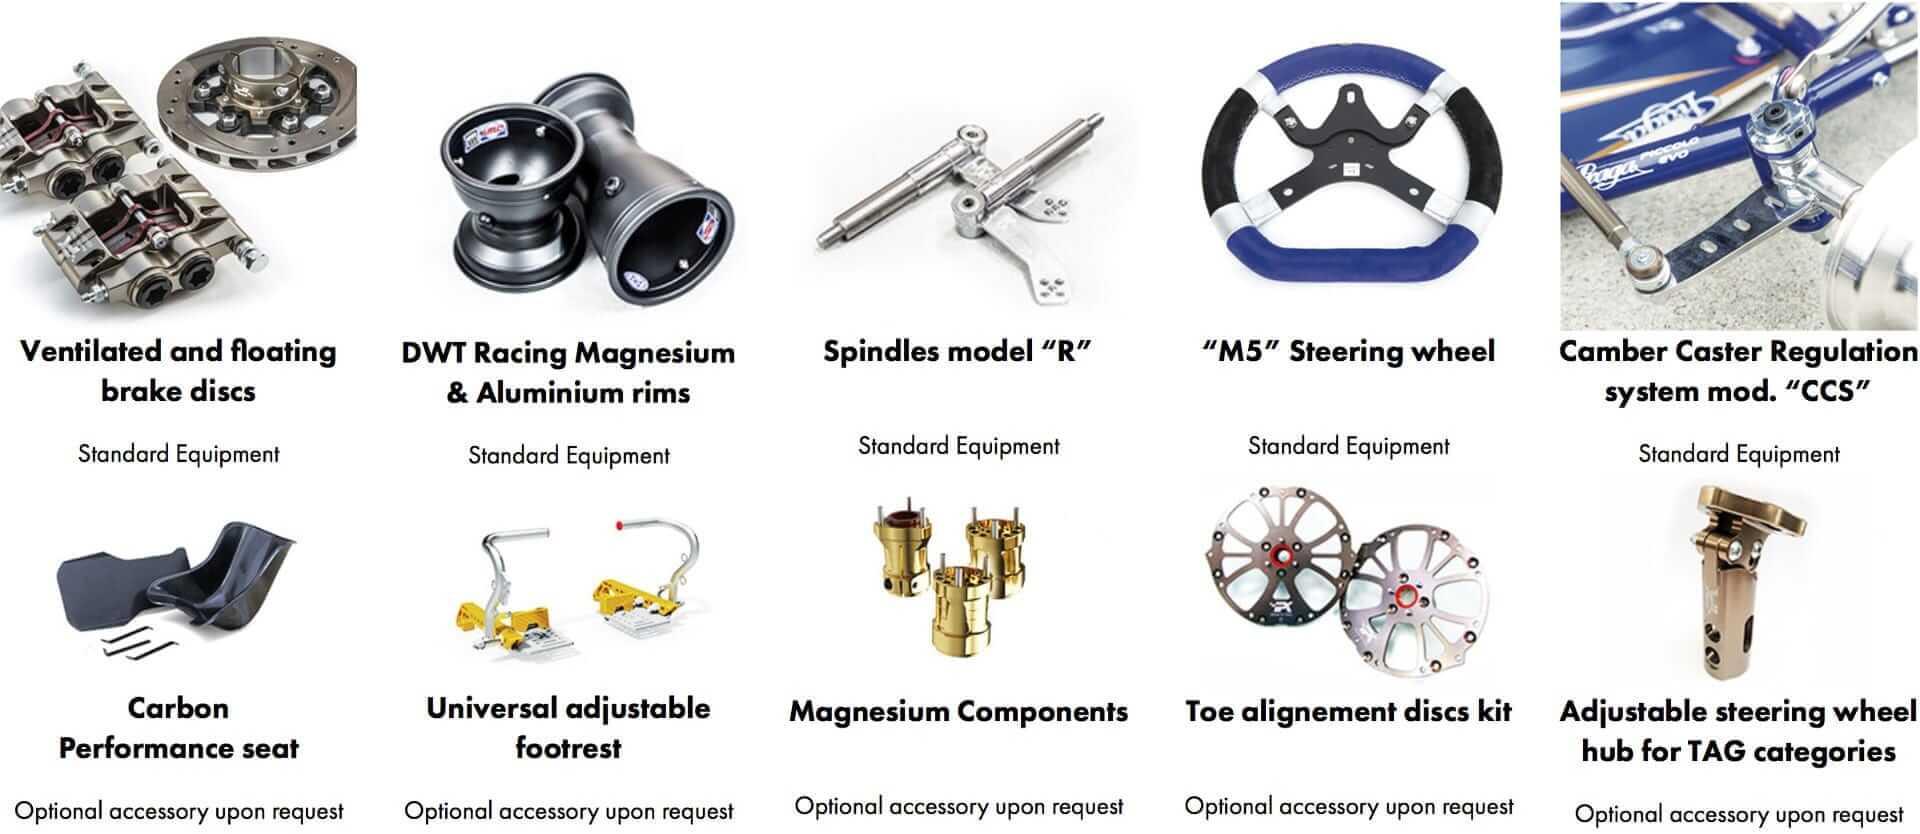 Praga Invictus Evo Amp Karting Wheel Hub Diagram Standard Equipment And Options